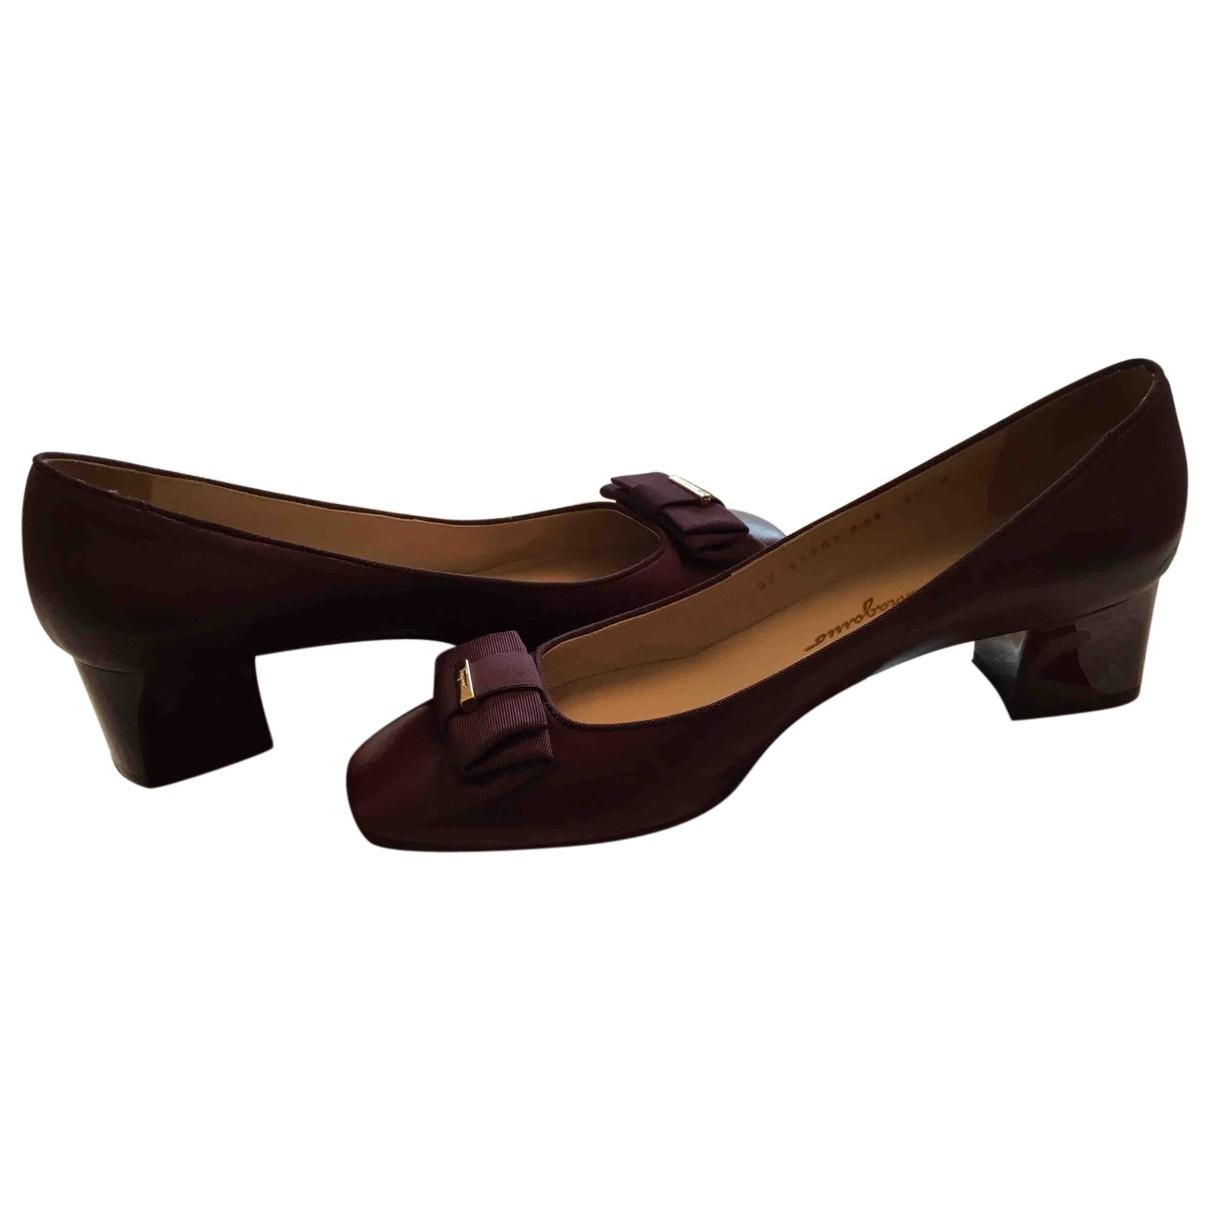 Salvatore Ferragamo \N Purple Leather Heels for Women 8.5 US